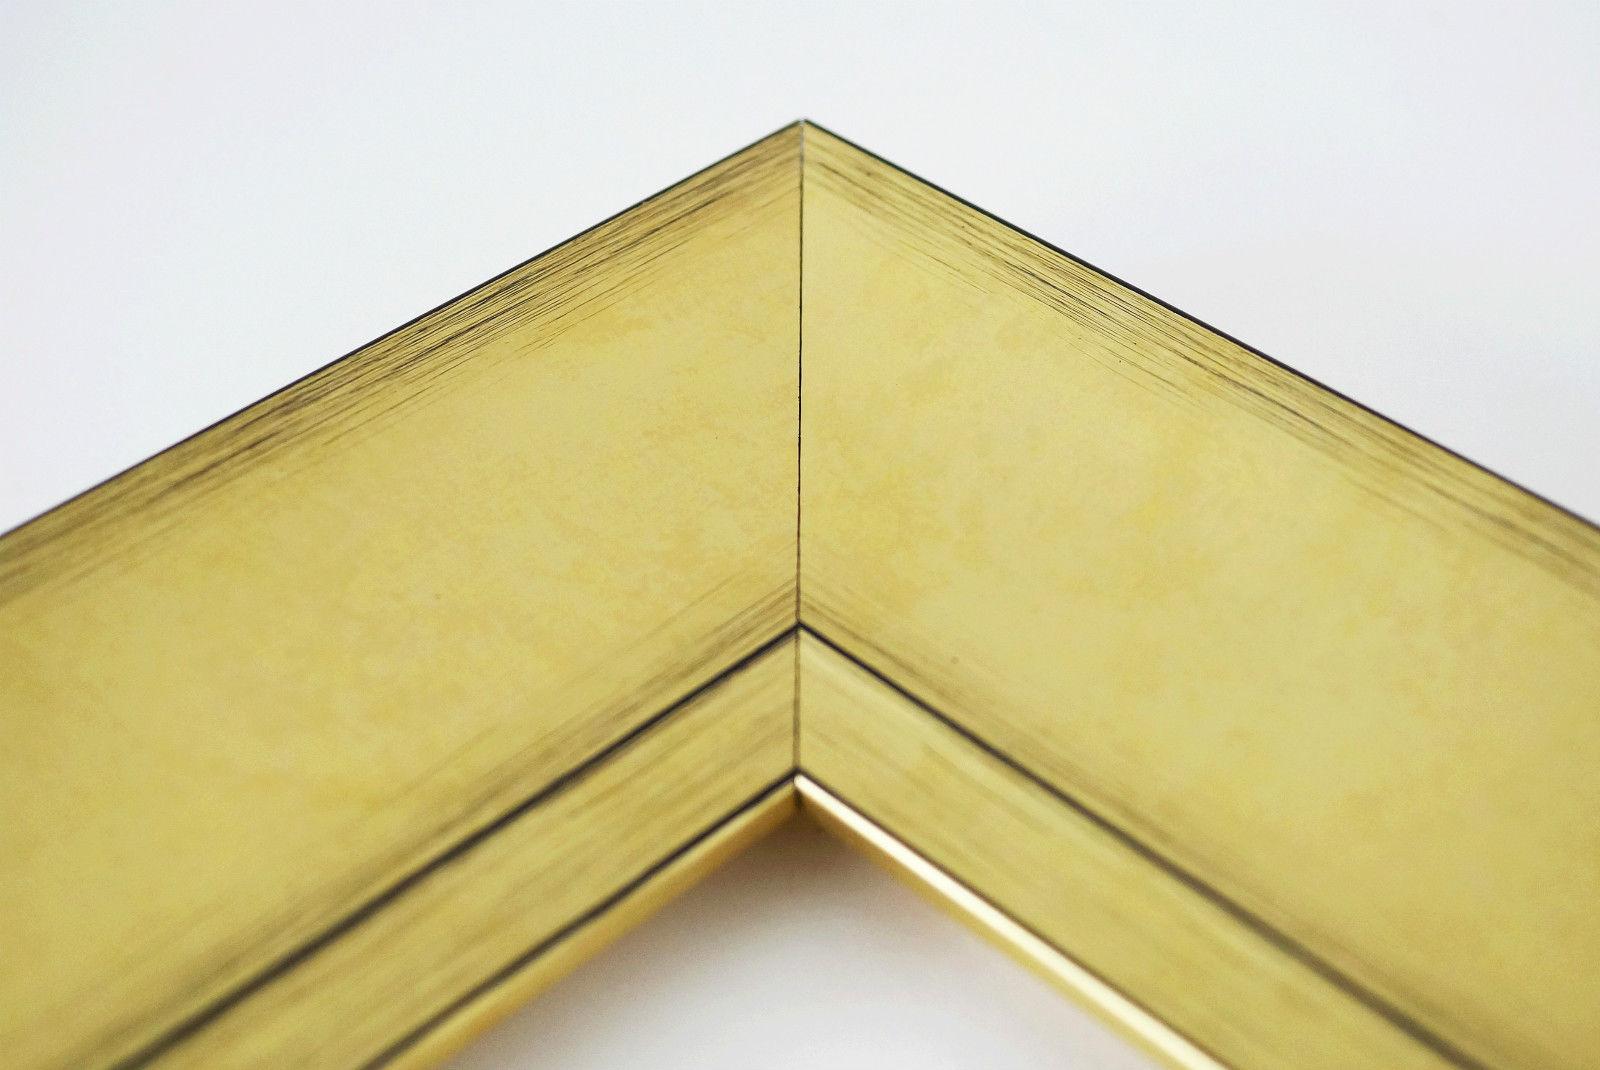 spiegel wandspiegel bad flur garderobe modern shabby bochum gold 6 9 alle gr en kaufen bei. Black Bedroom Furniture Sets. Home Design Ideas